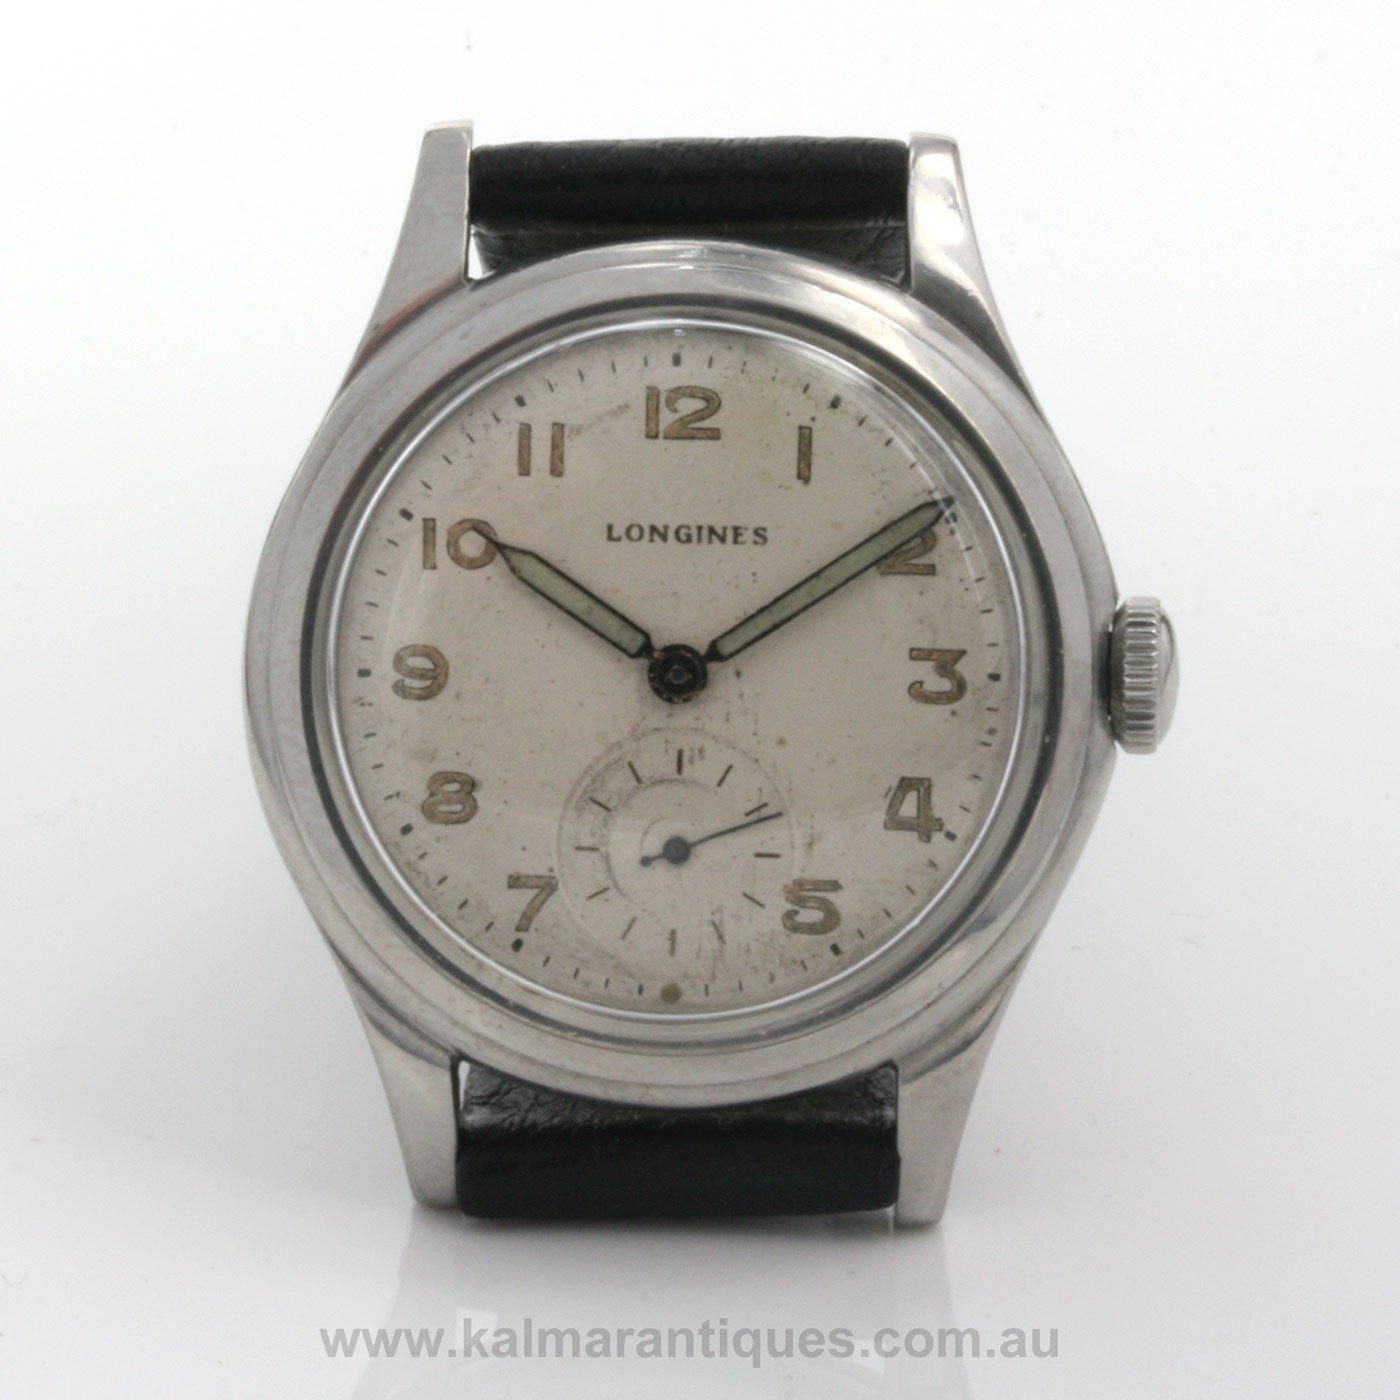 buy vintage 1945 longines calibre 687 sold items